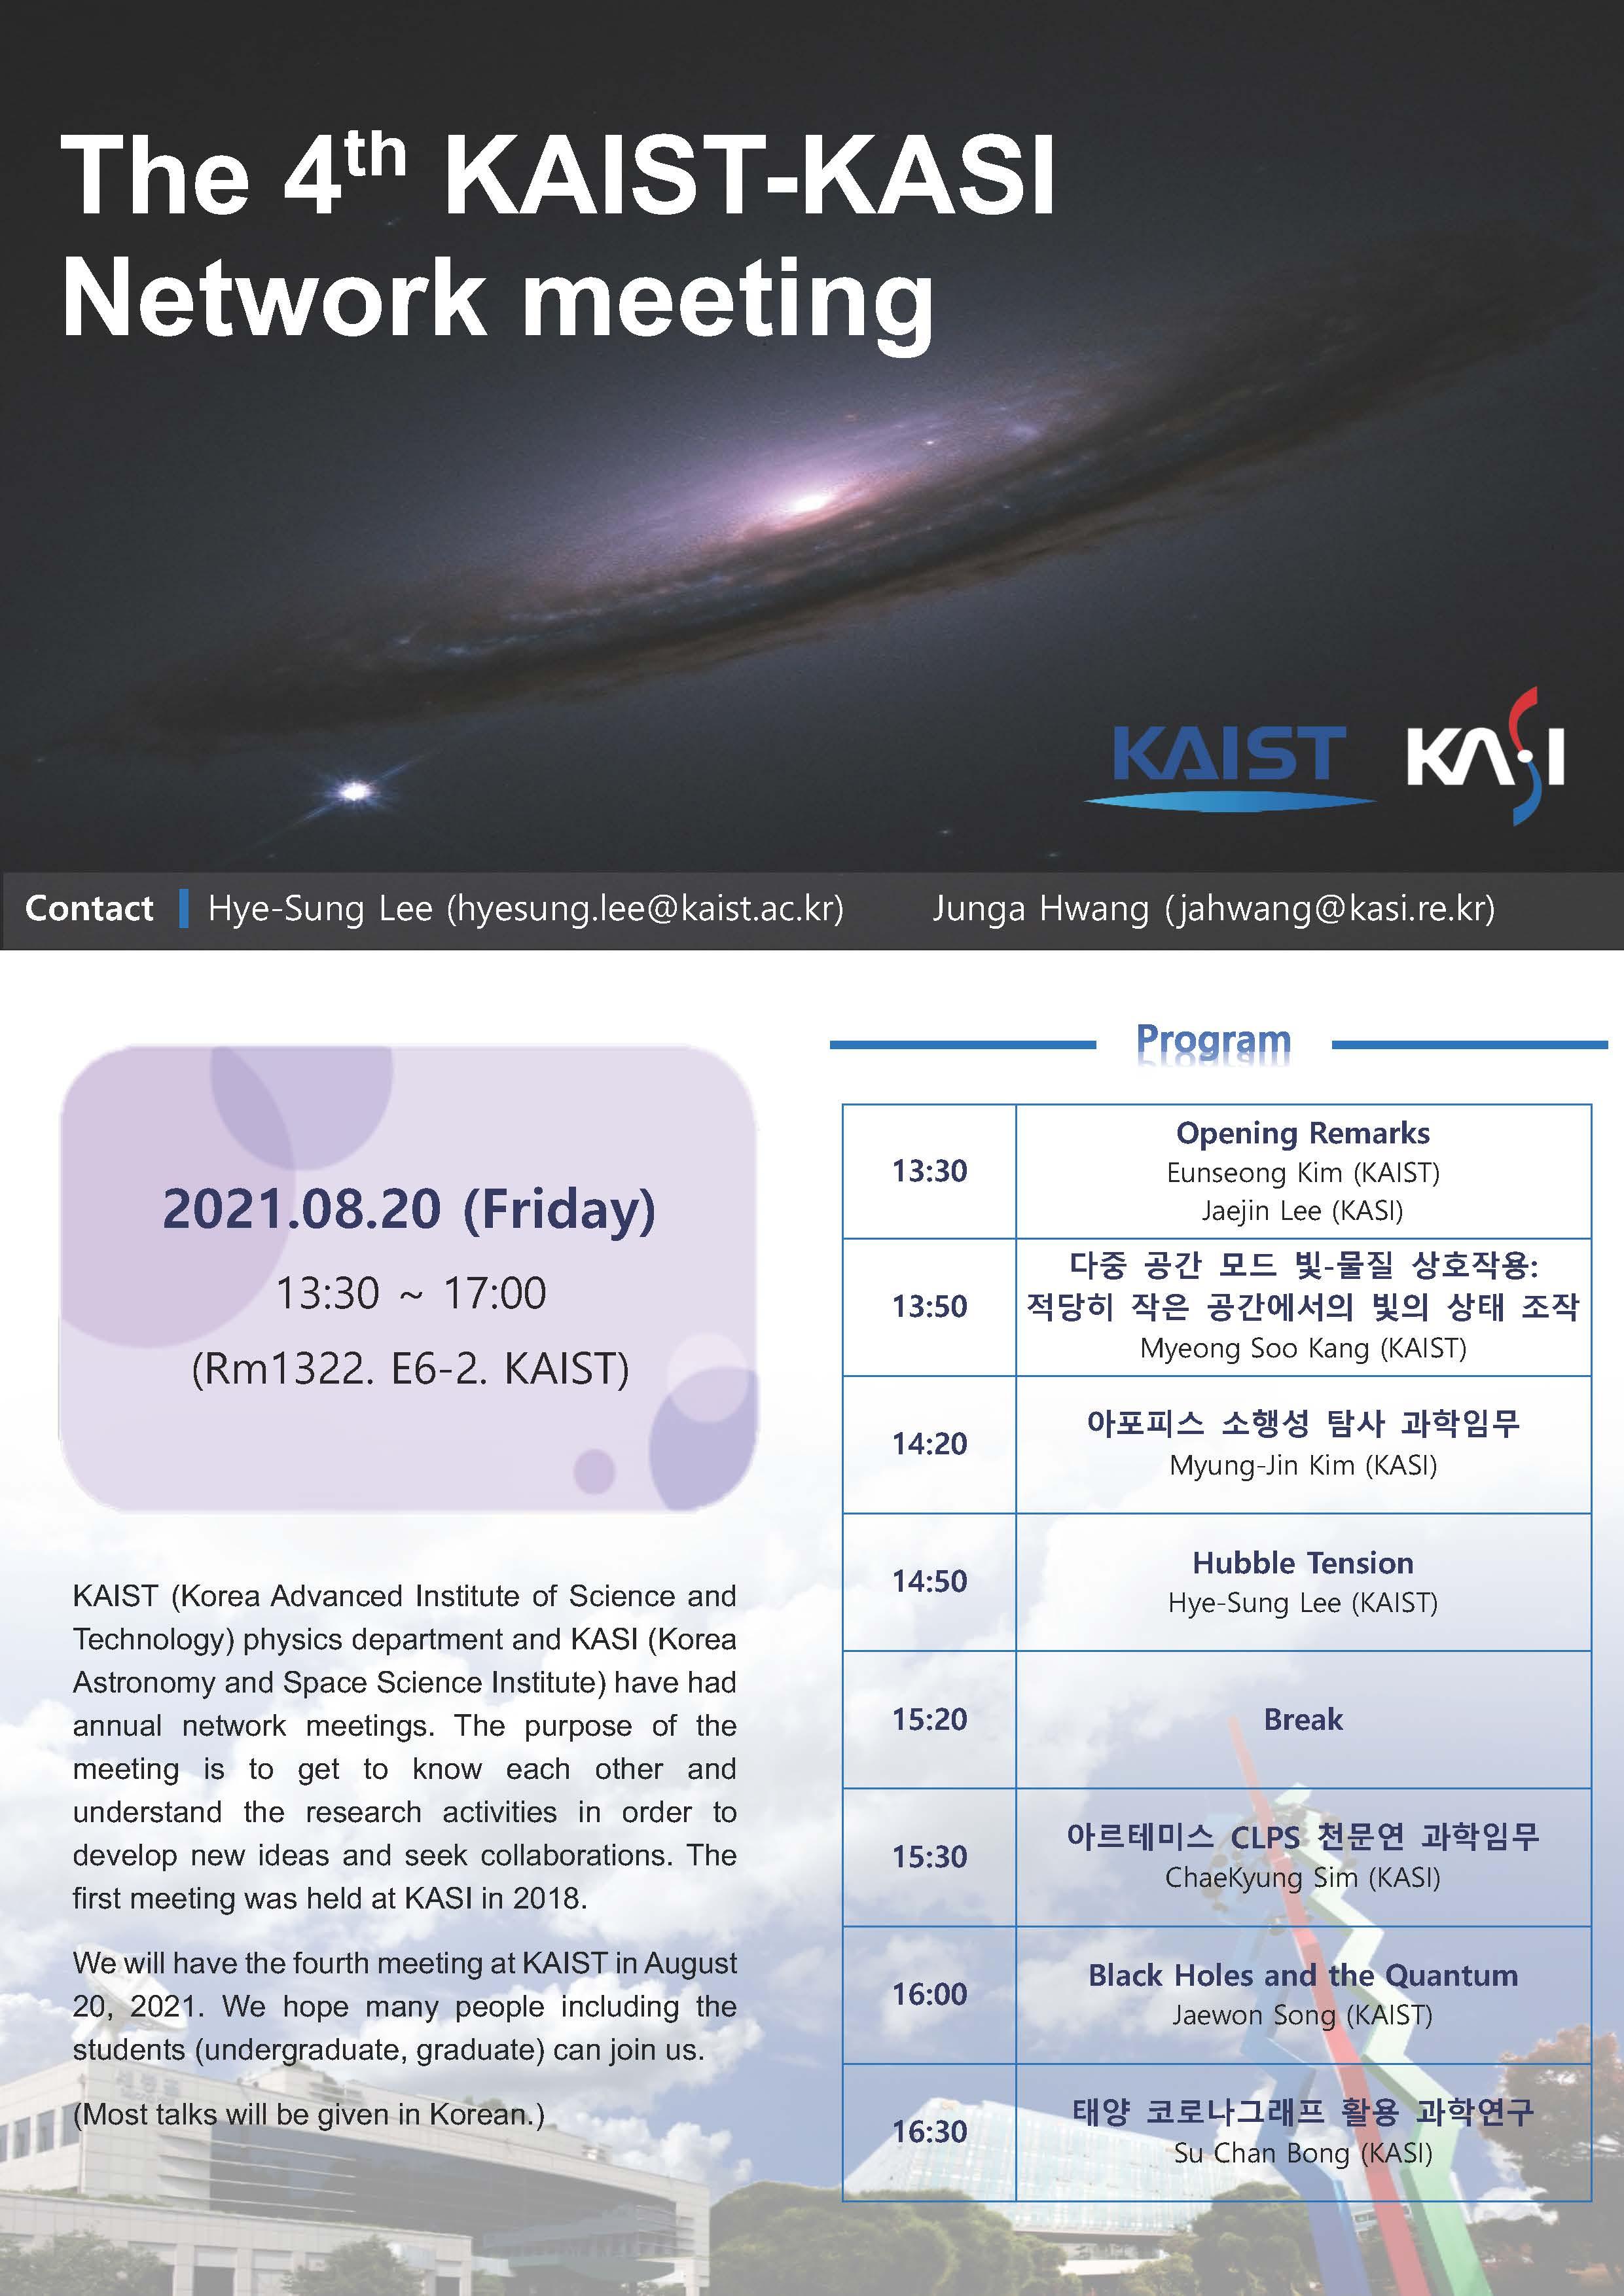 4th KAIST-KASI Network meeting poster.jpg